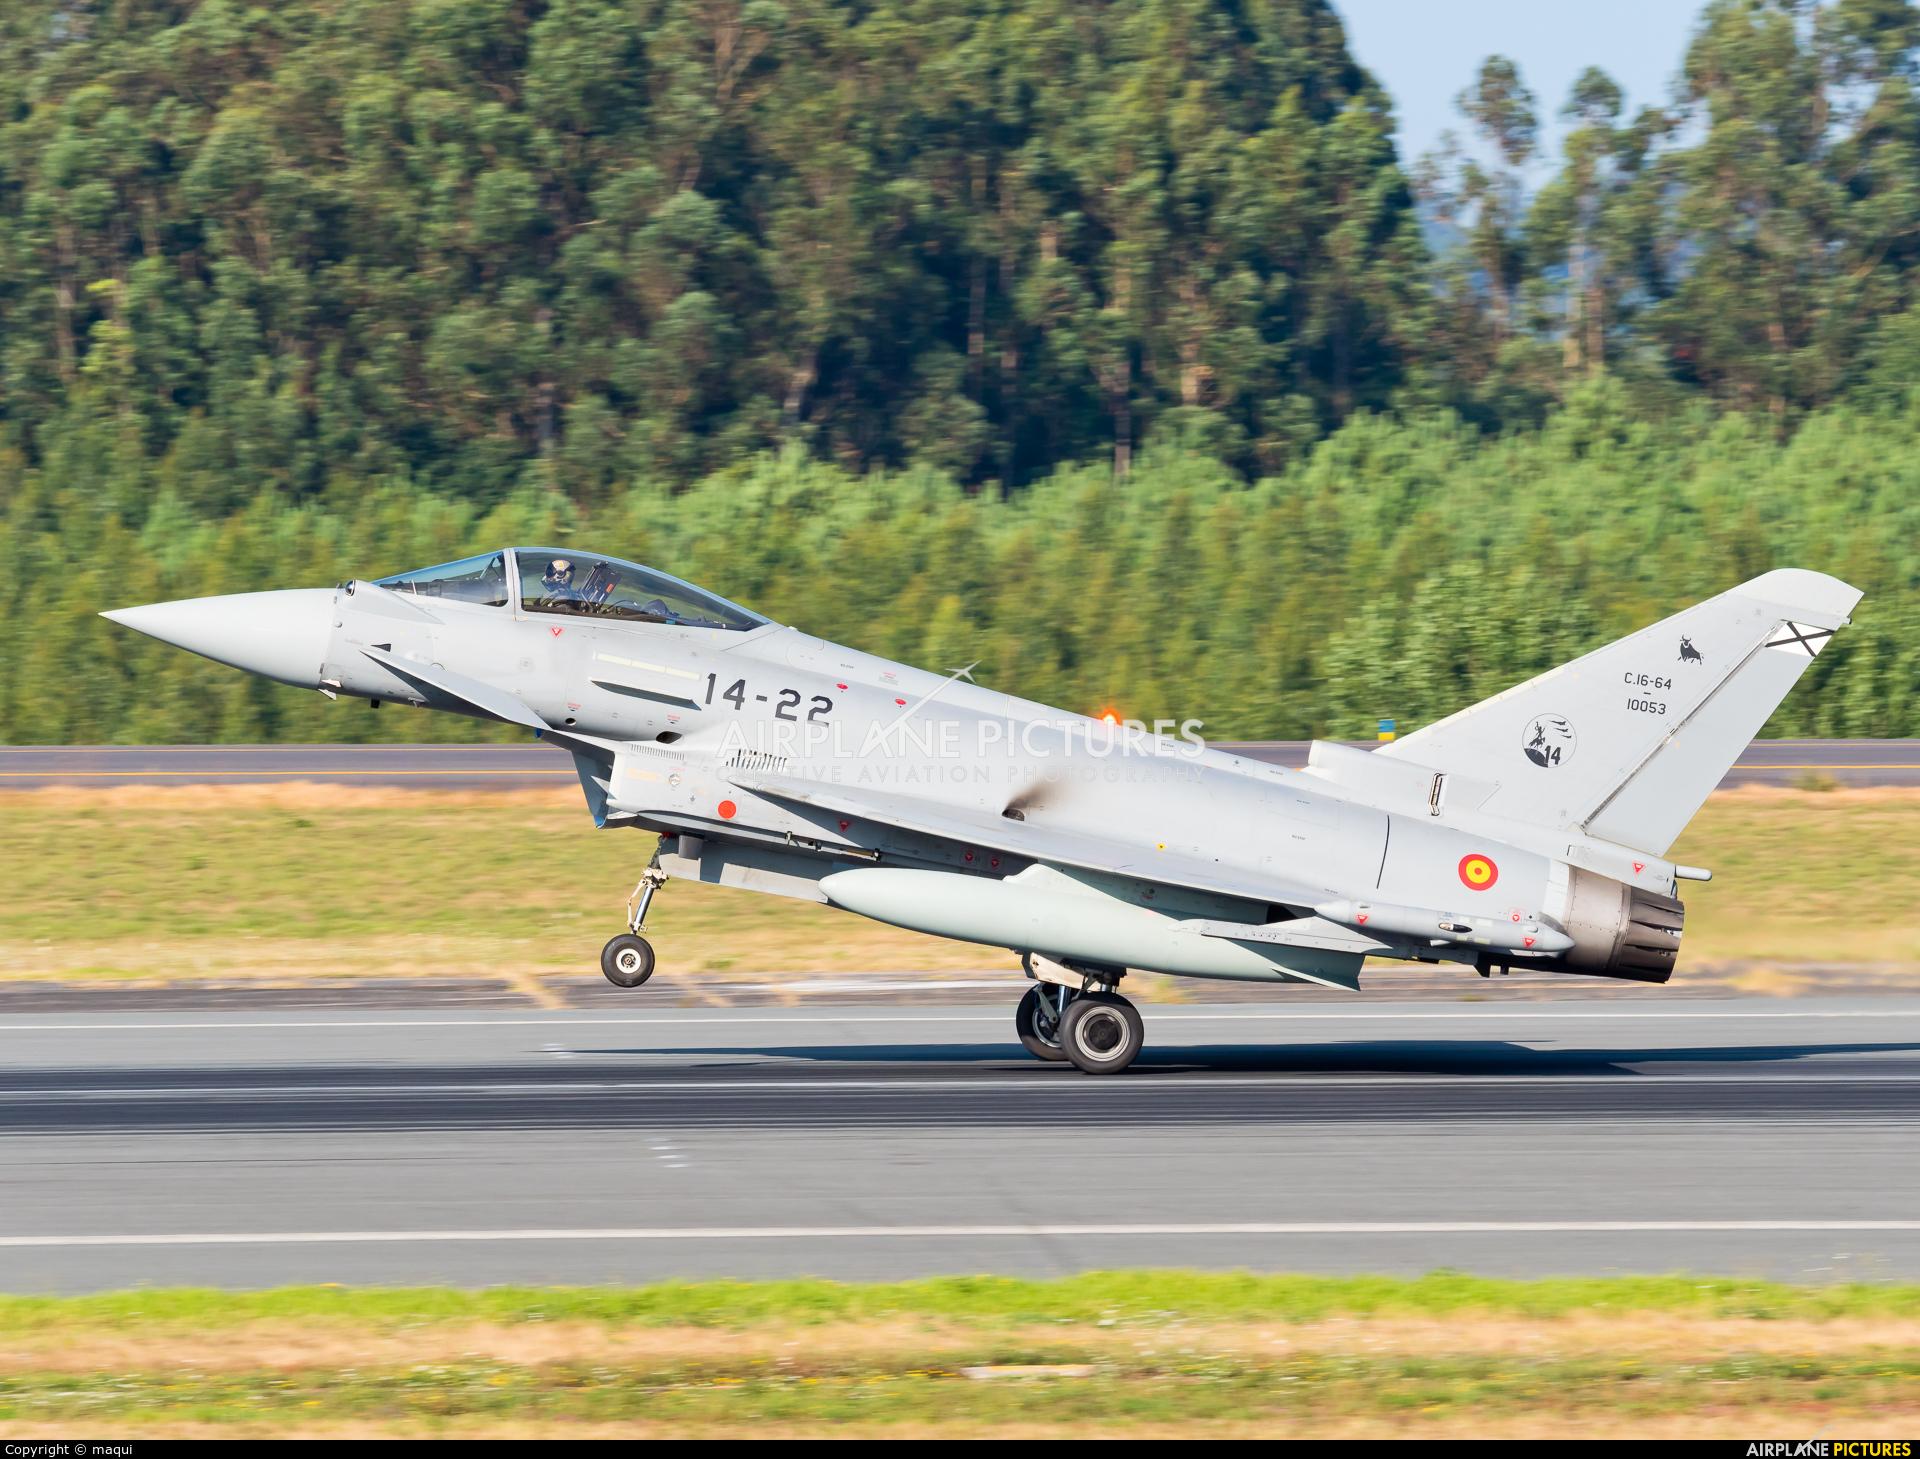 Spain - Air Force C.16-64 aircraft at Santiago de Compostela